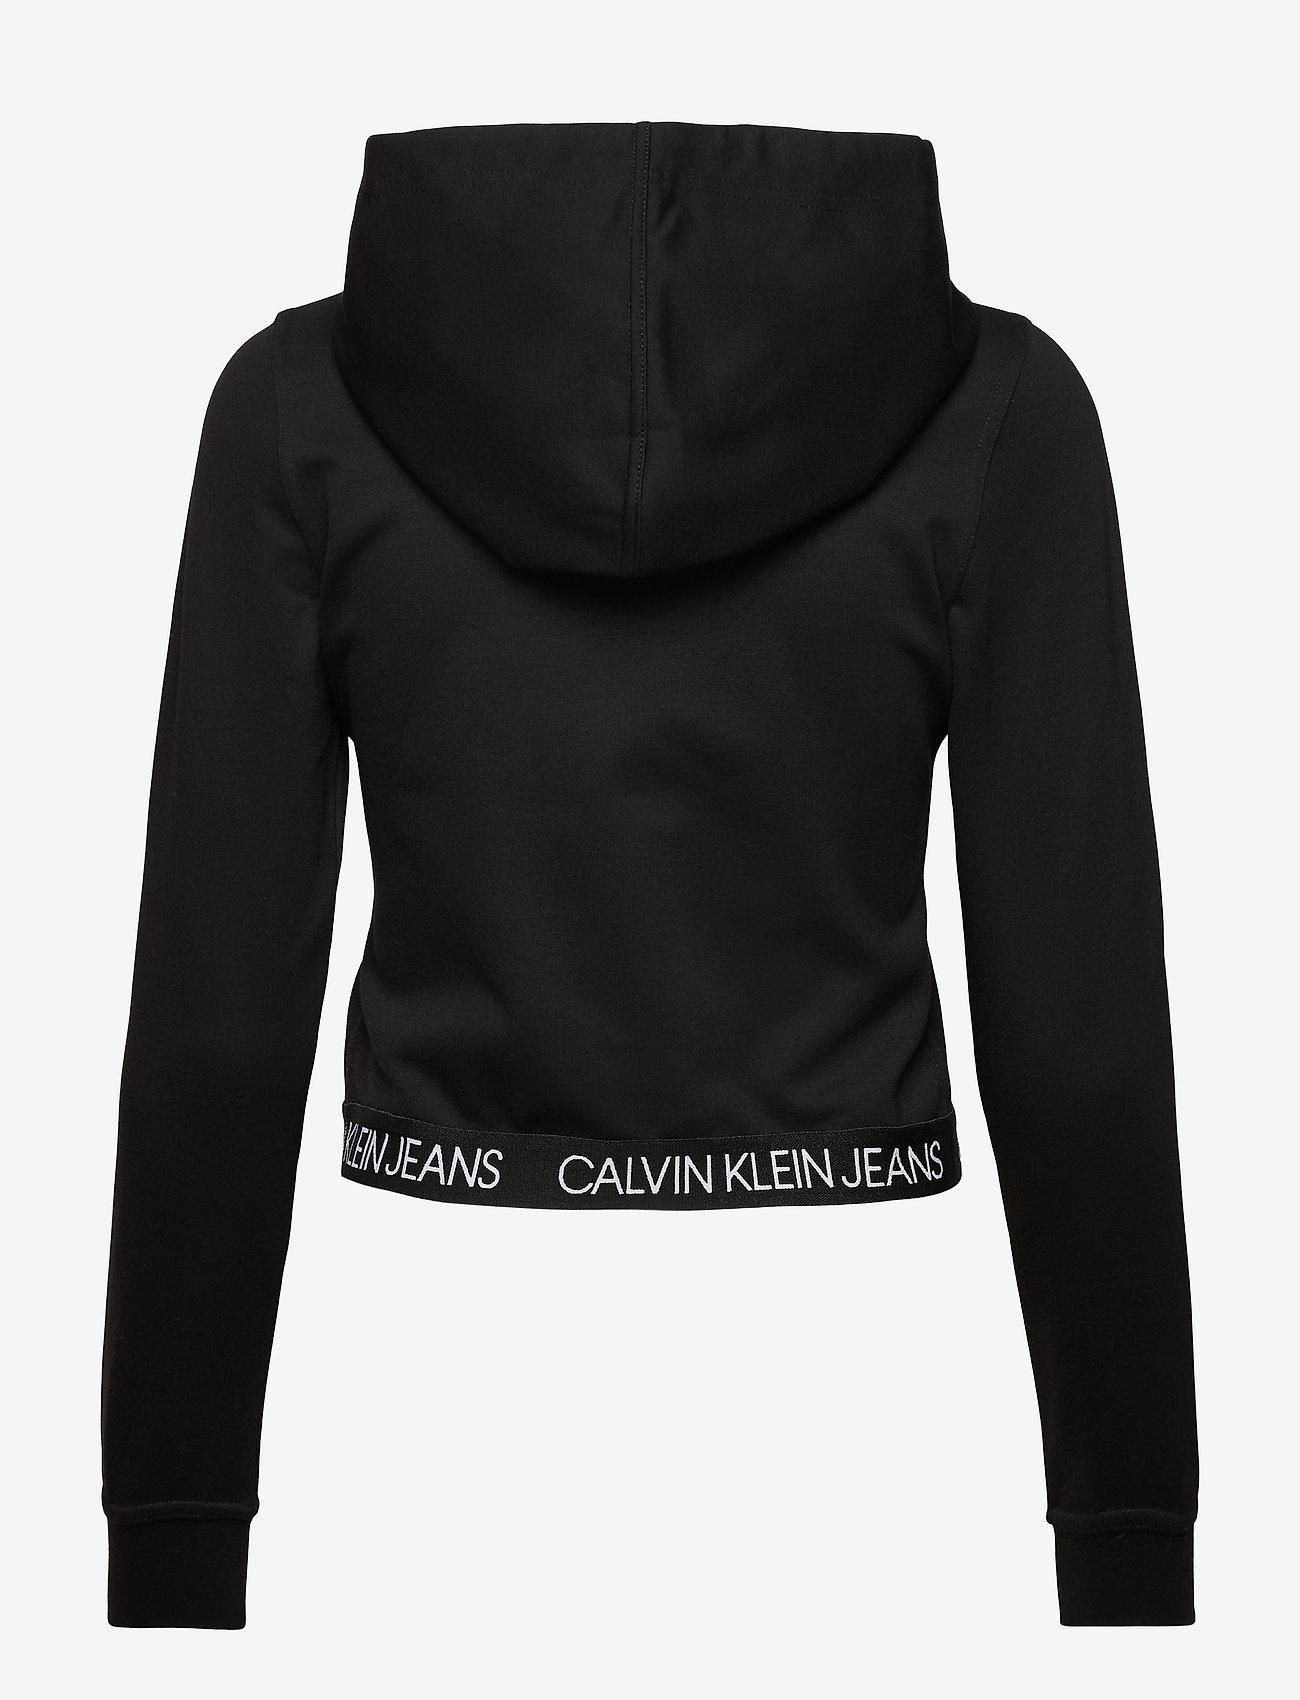 Calvin Klein Jeans - LOGO ELASTIC MILANO HOODIE - hettegensere - ck black - 1